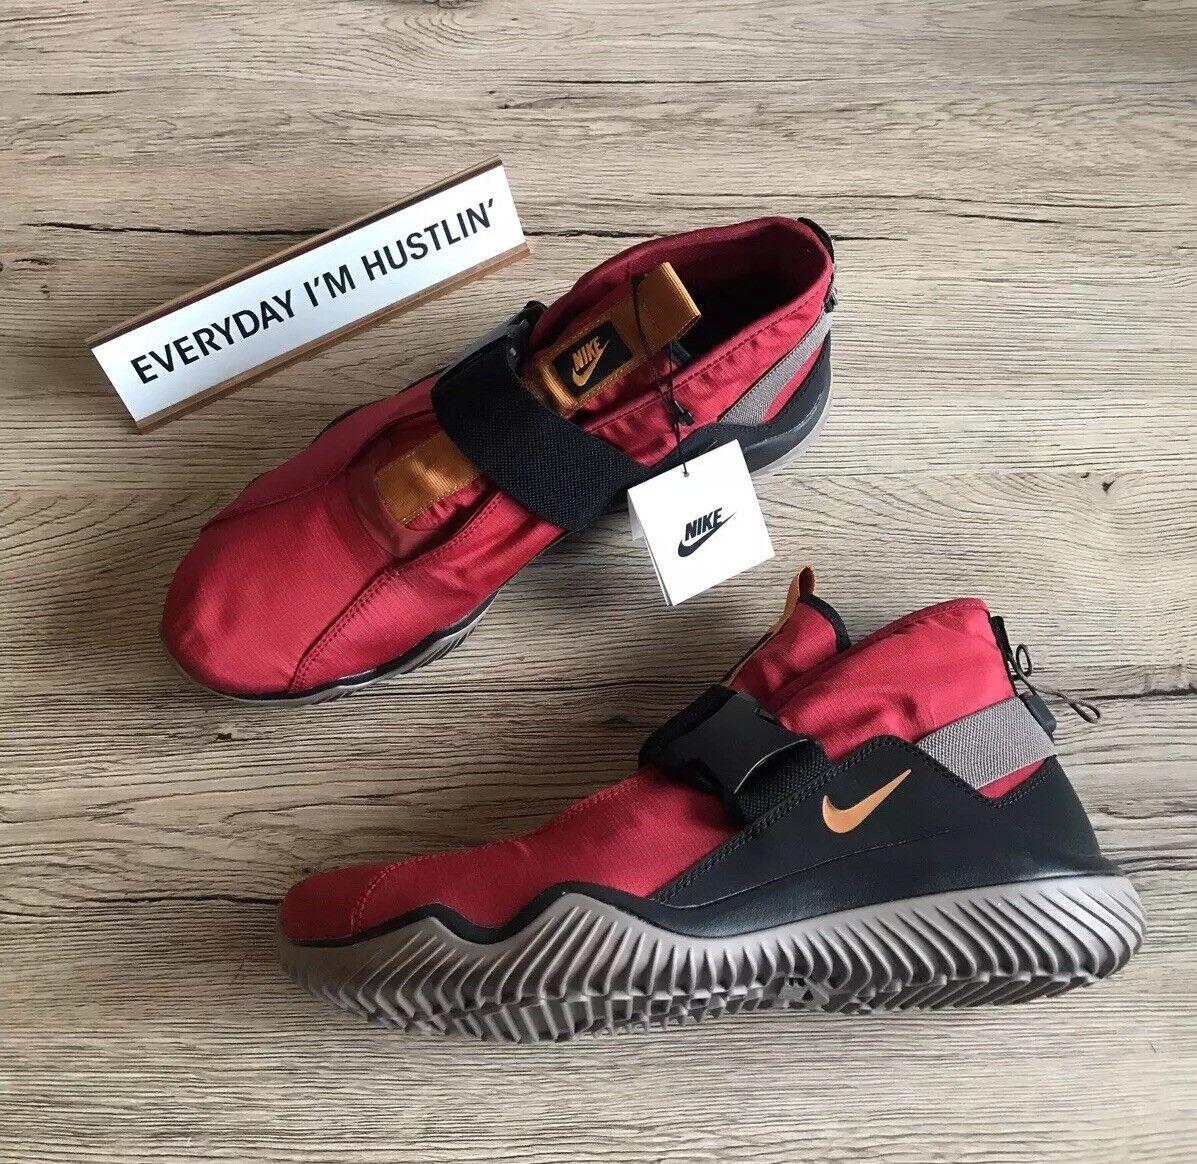 NWT Nike Komyuter ESS Sneakers, AQ8141600